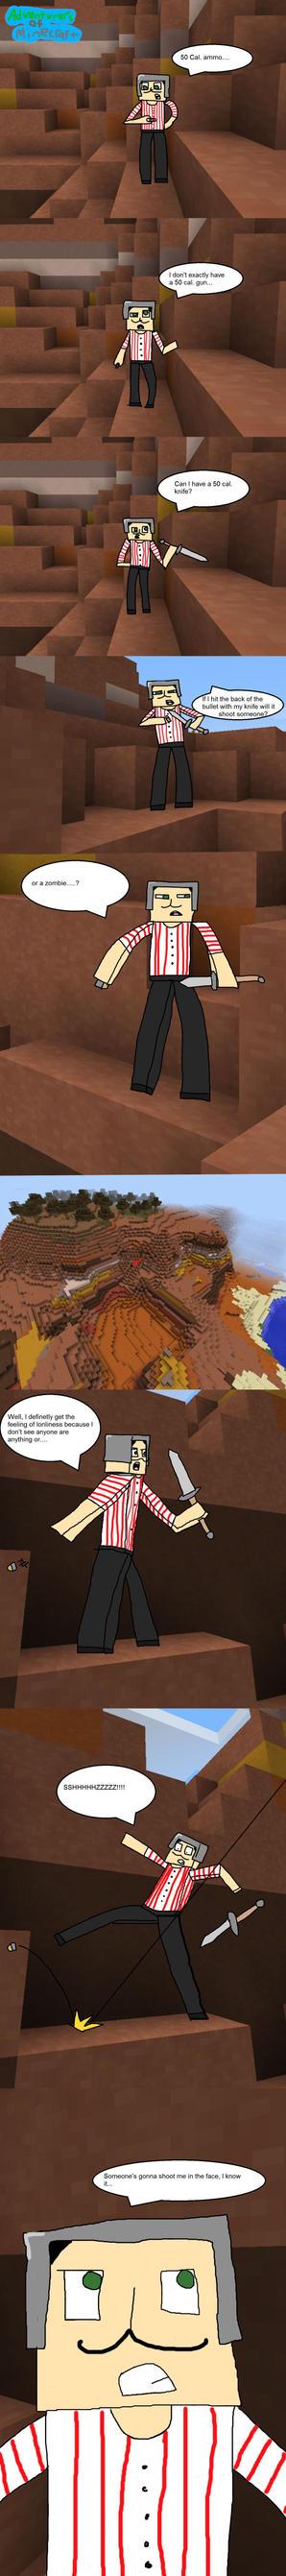 Minecraft Calibers by Shadobian11